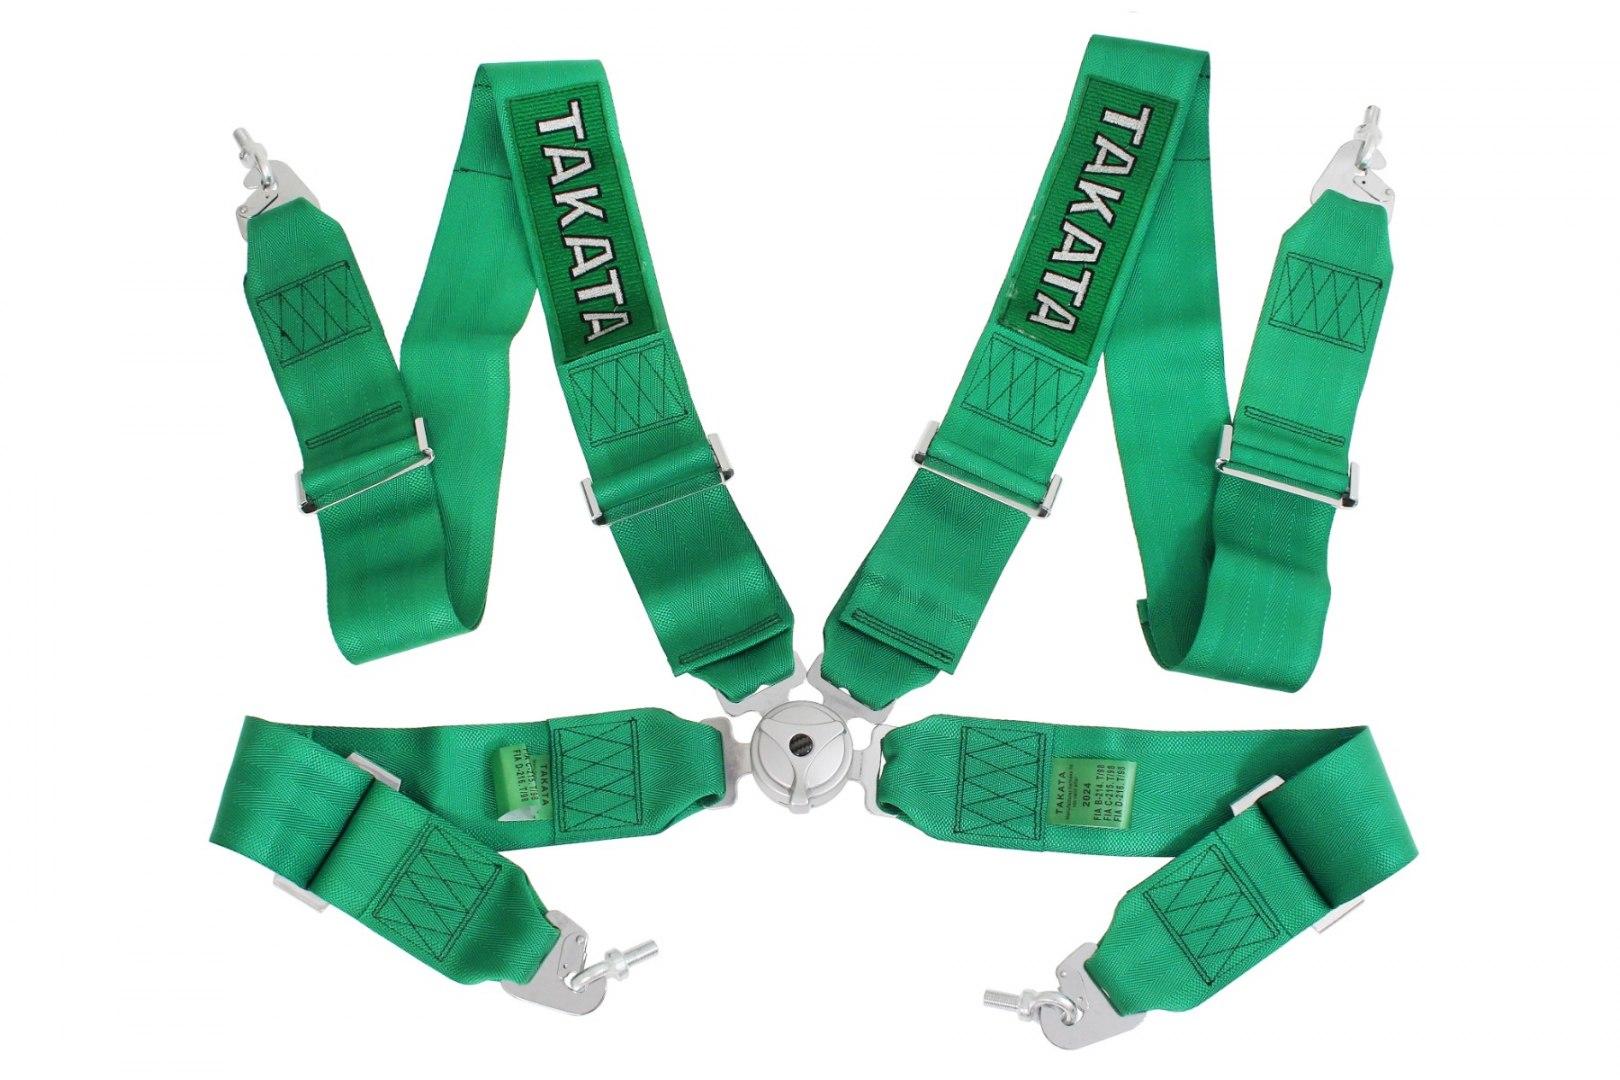 "Pasy sportowe 4p 3"" Green - Takata Replica harness - GRUBYGARAGE - Sklep Tuningowy"